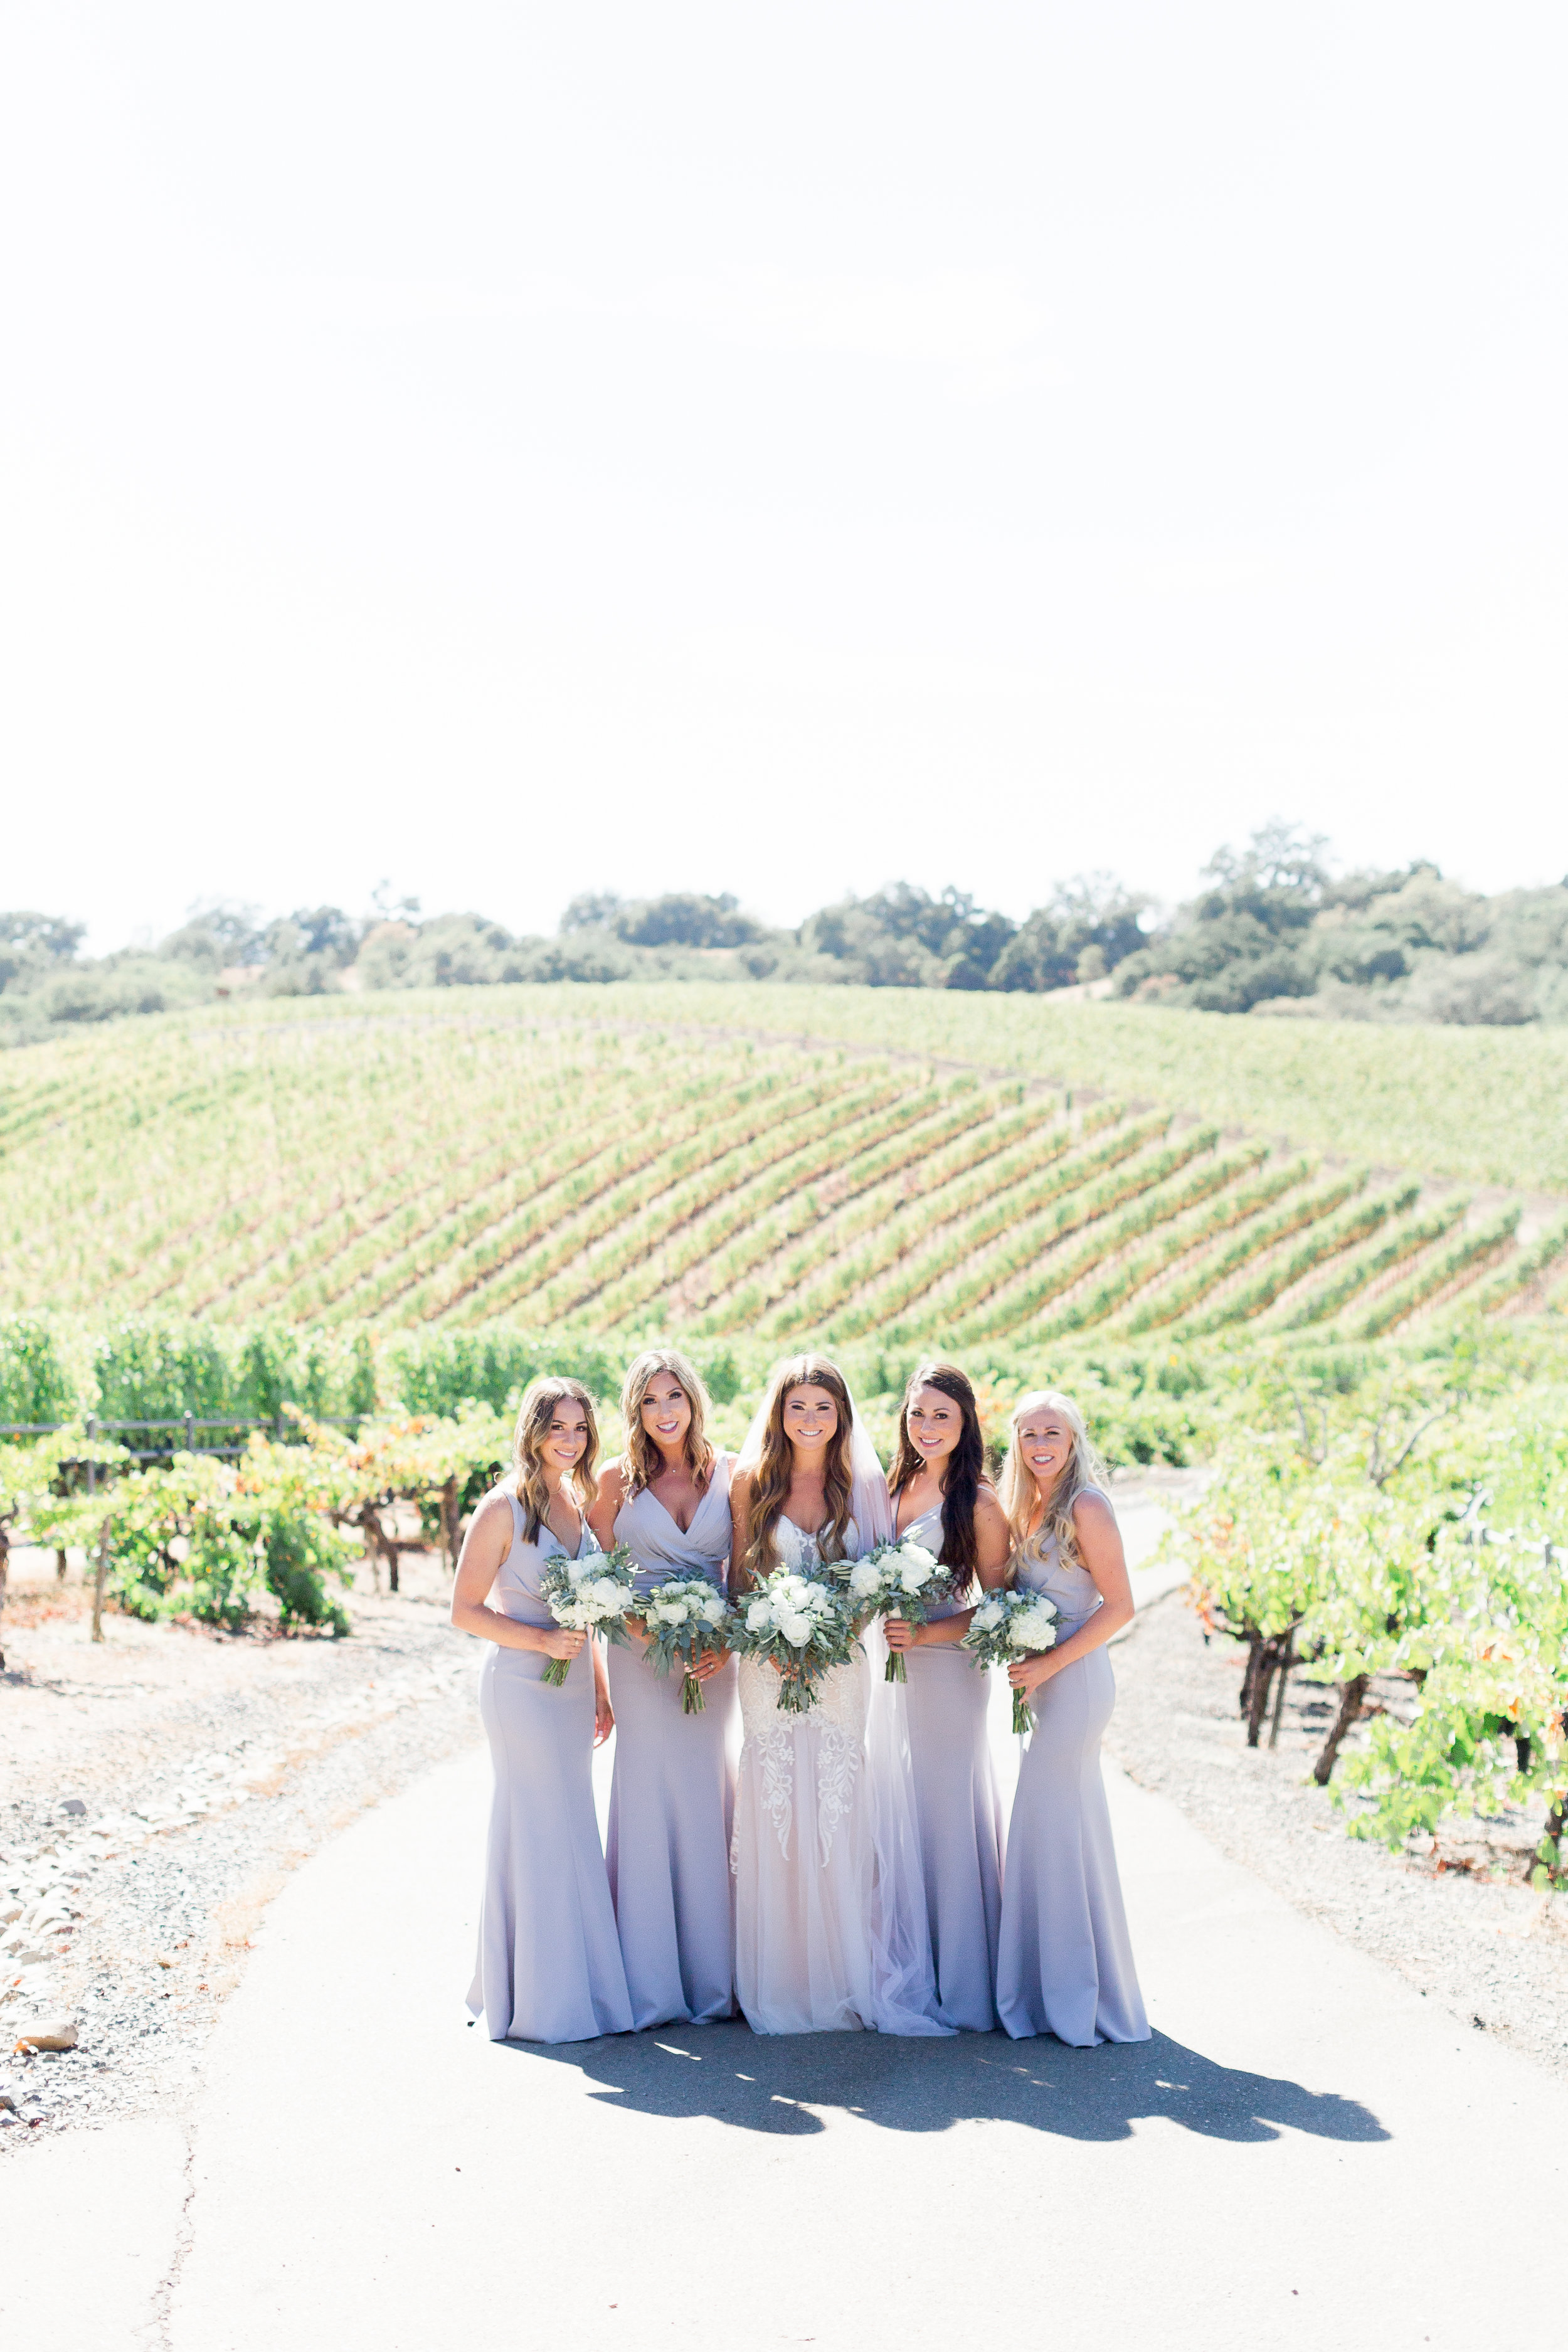 Calegari-Vineyards-Healdsburg-Wedding-Photographer (112 of 262).jpg